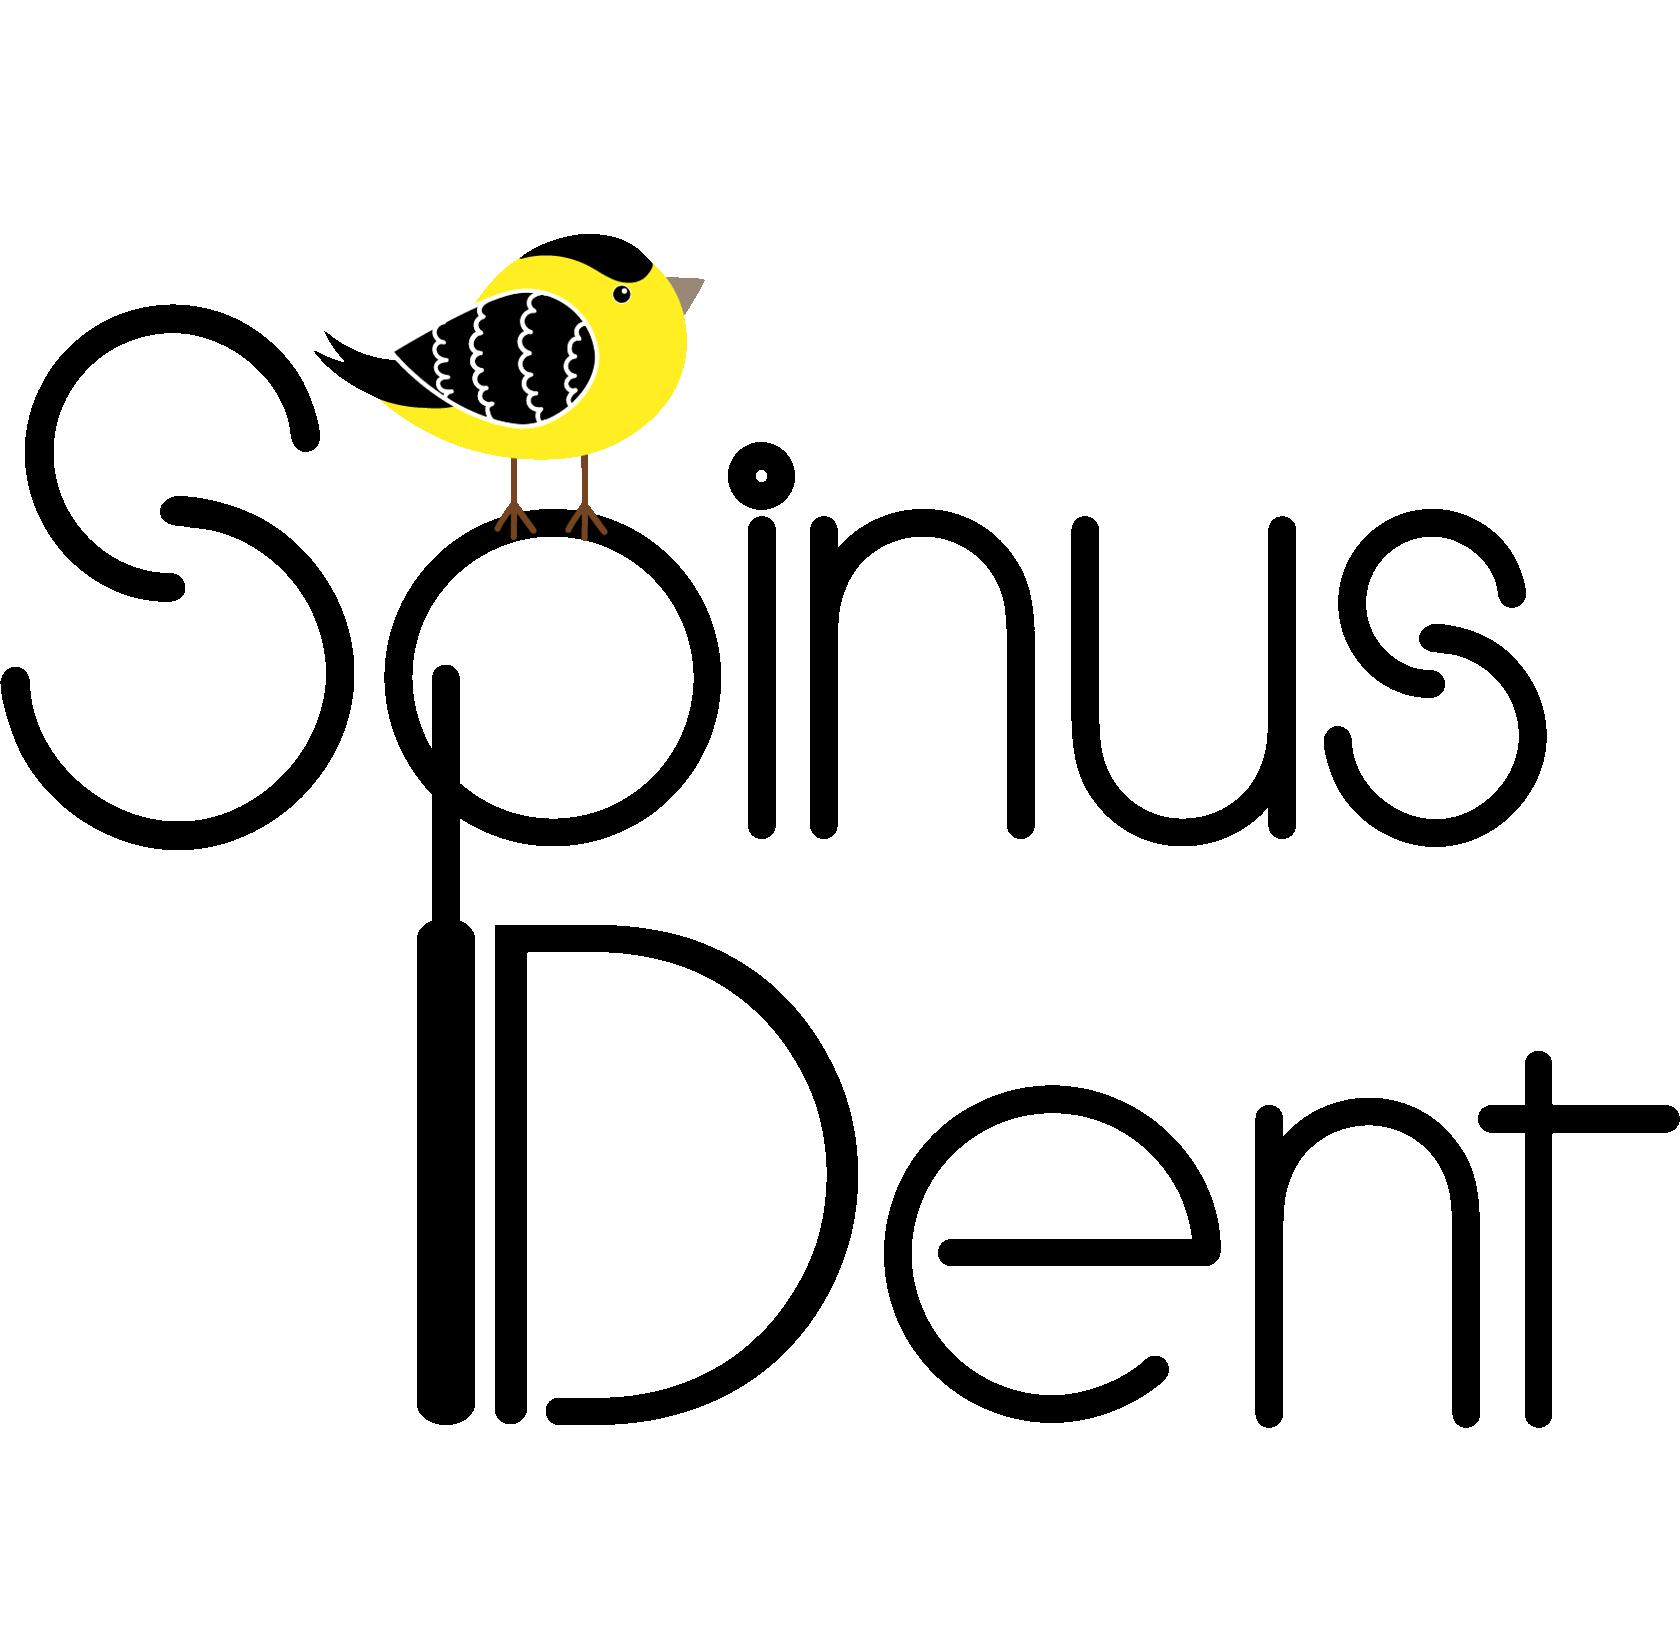 Spinus Dent